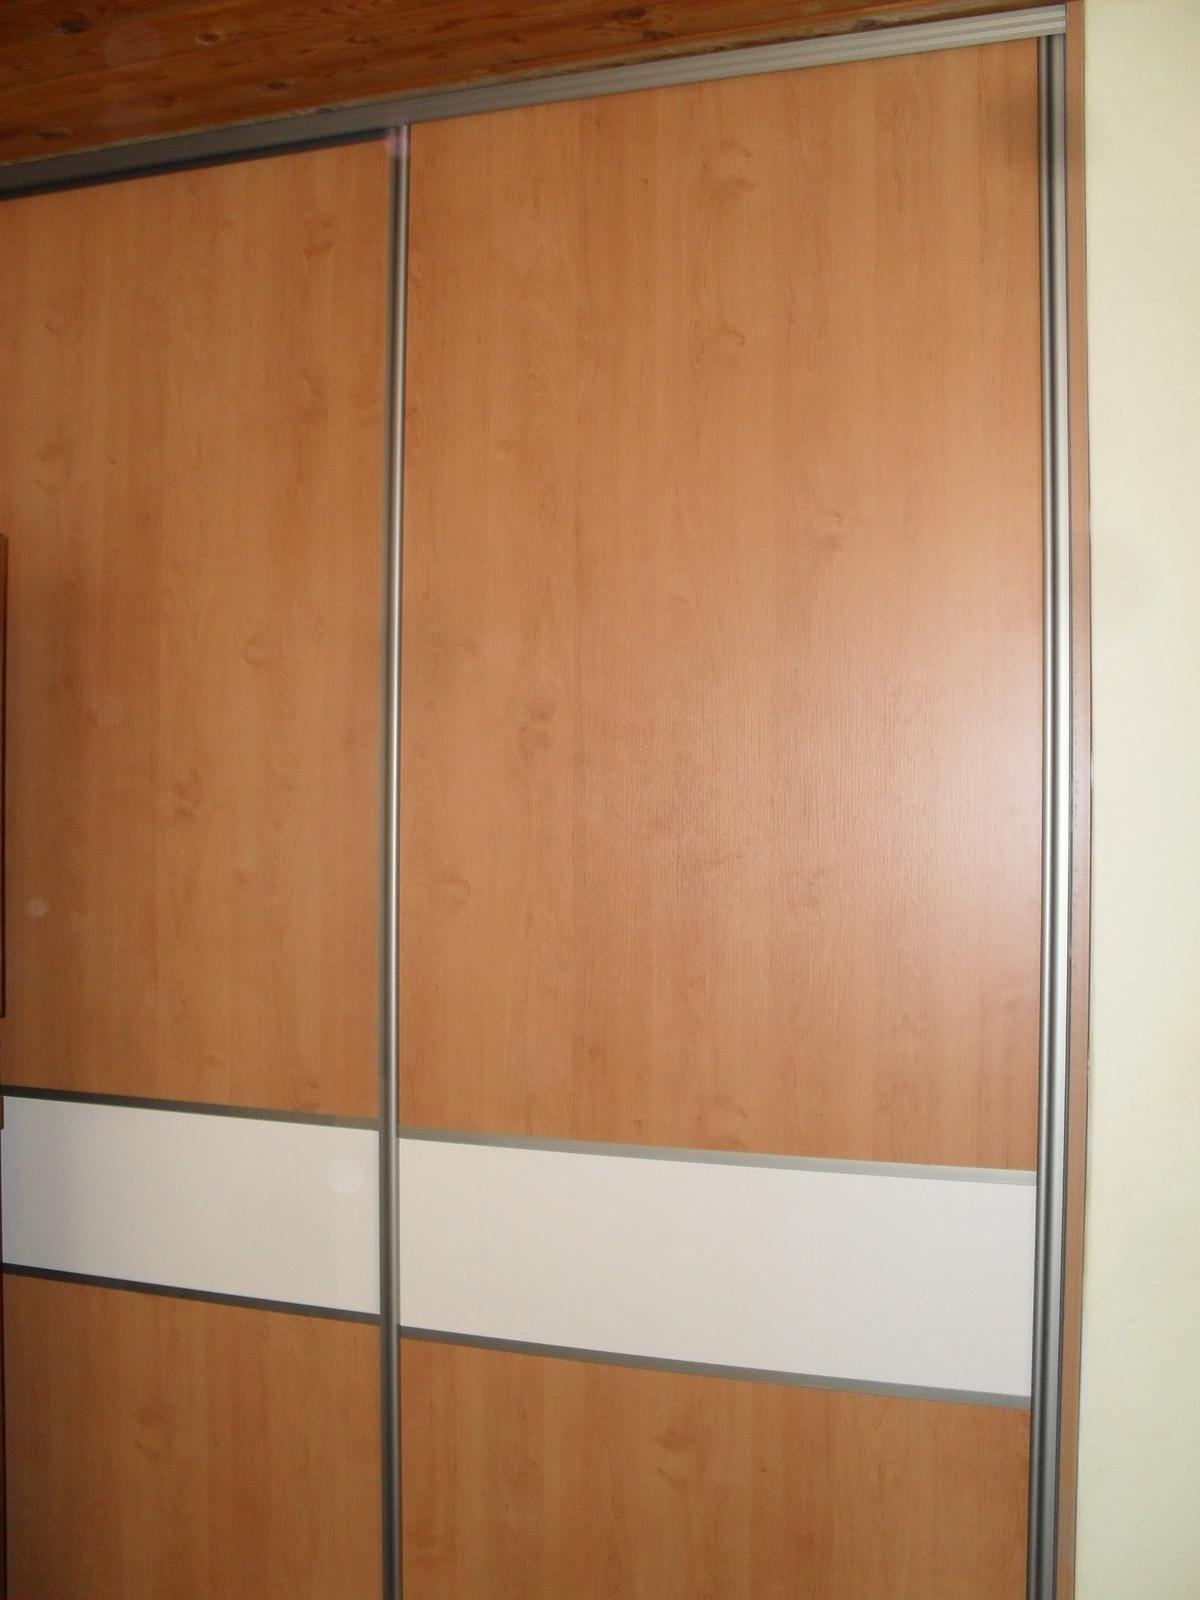 Vstavané skrine Martin Benko Bošany - Obrázok č. 11